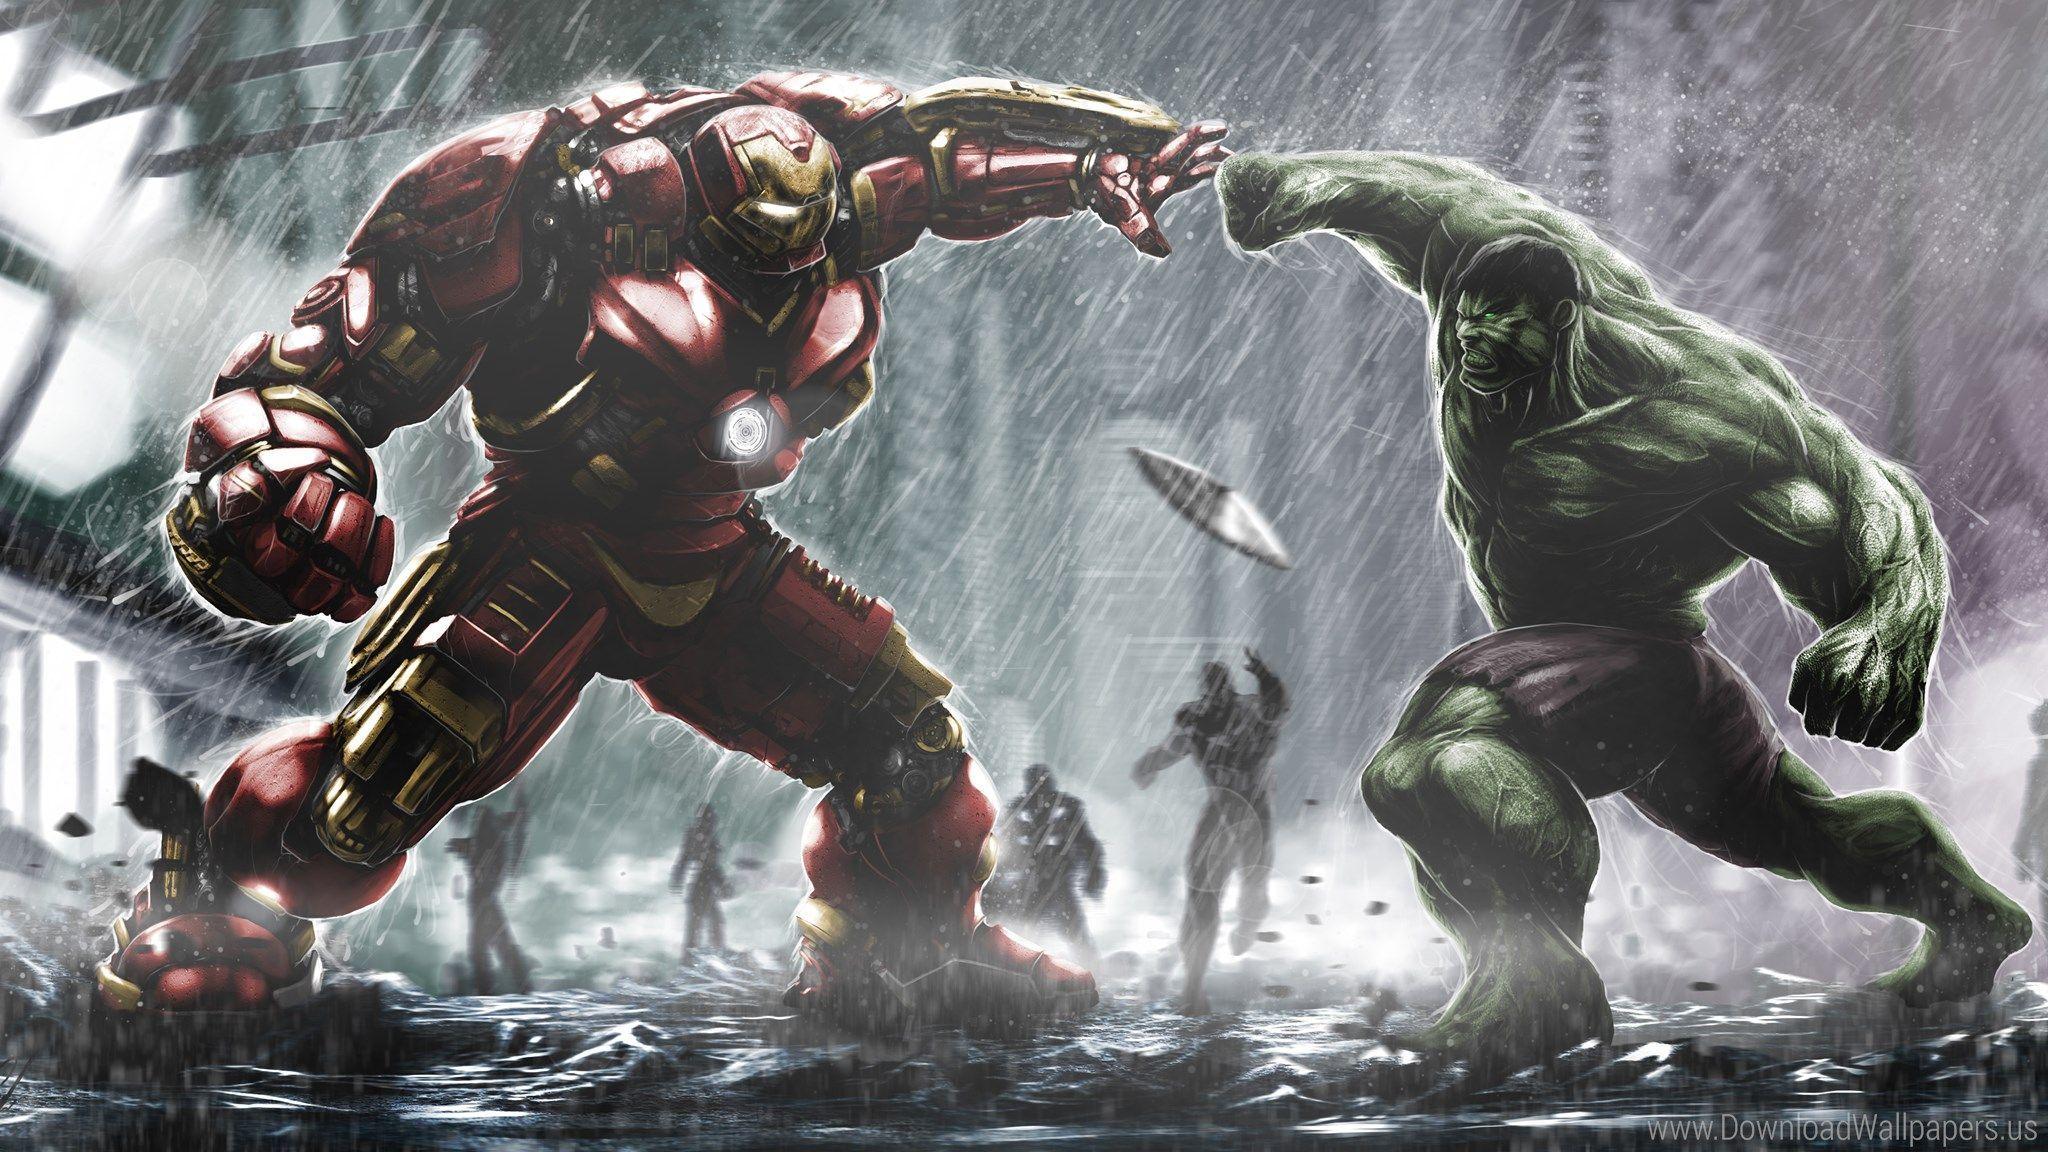 Avengers Dual Monitor Wallpapers Top Free Avengers Dual Monitor